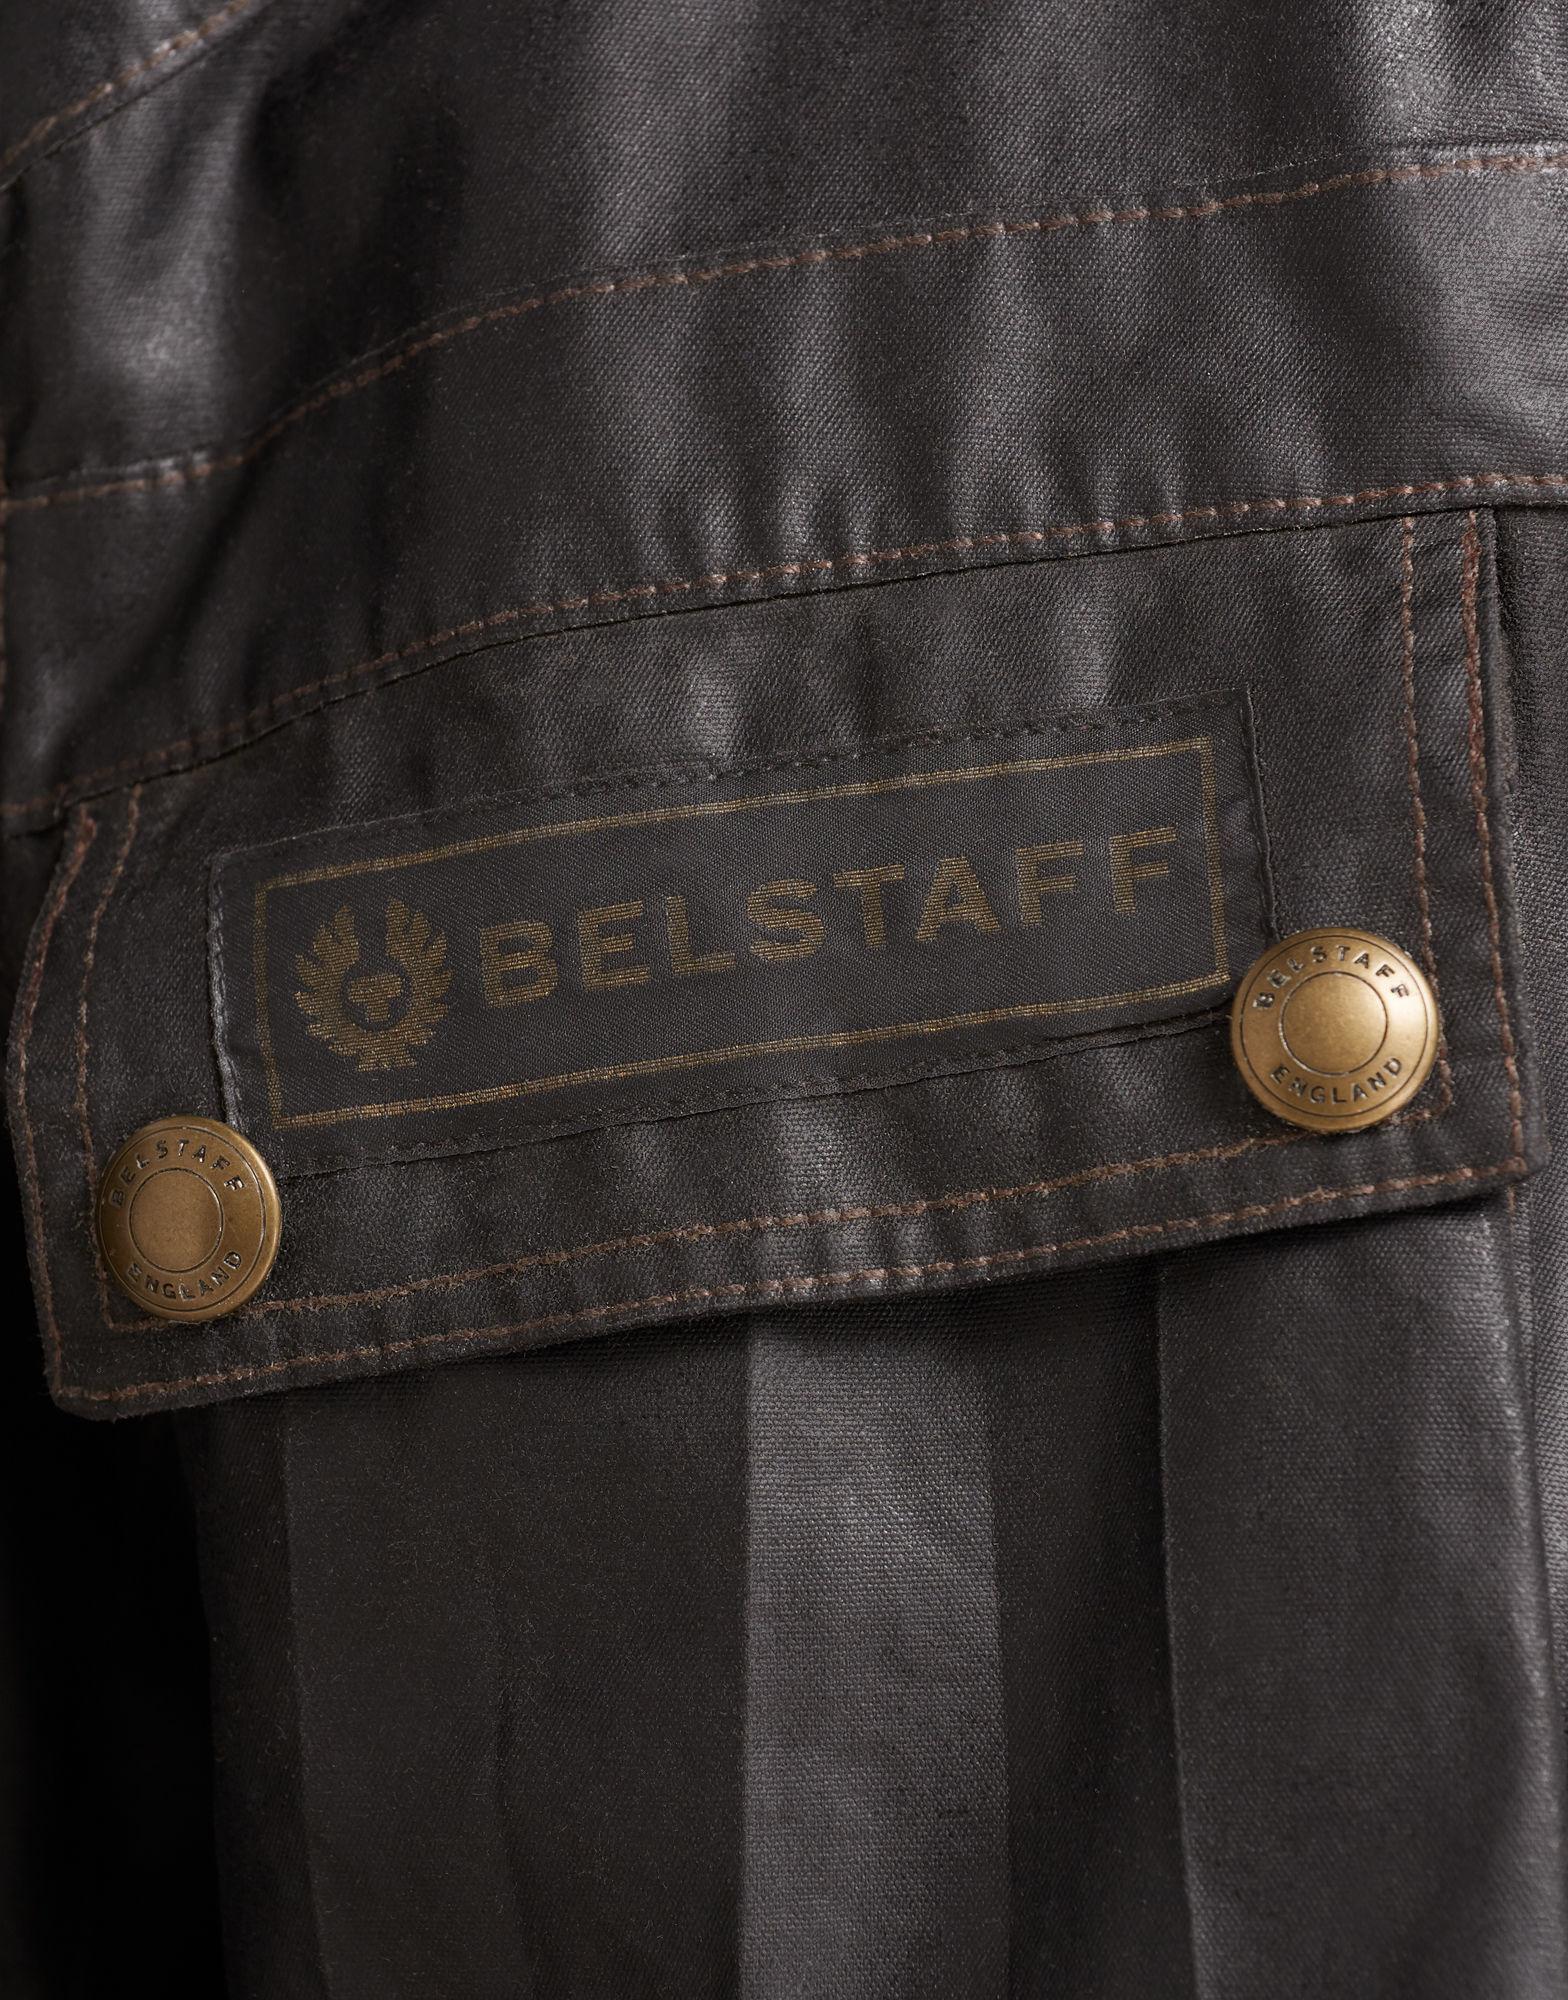 4ddd581e0199 Sammy The for Miller Belstaff Men Jacket in Black Lyst 7vqBxww